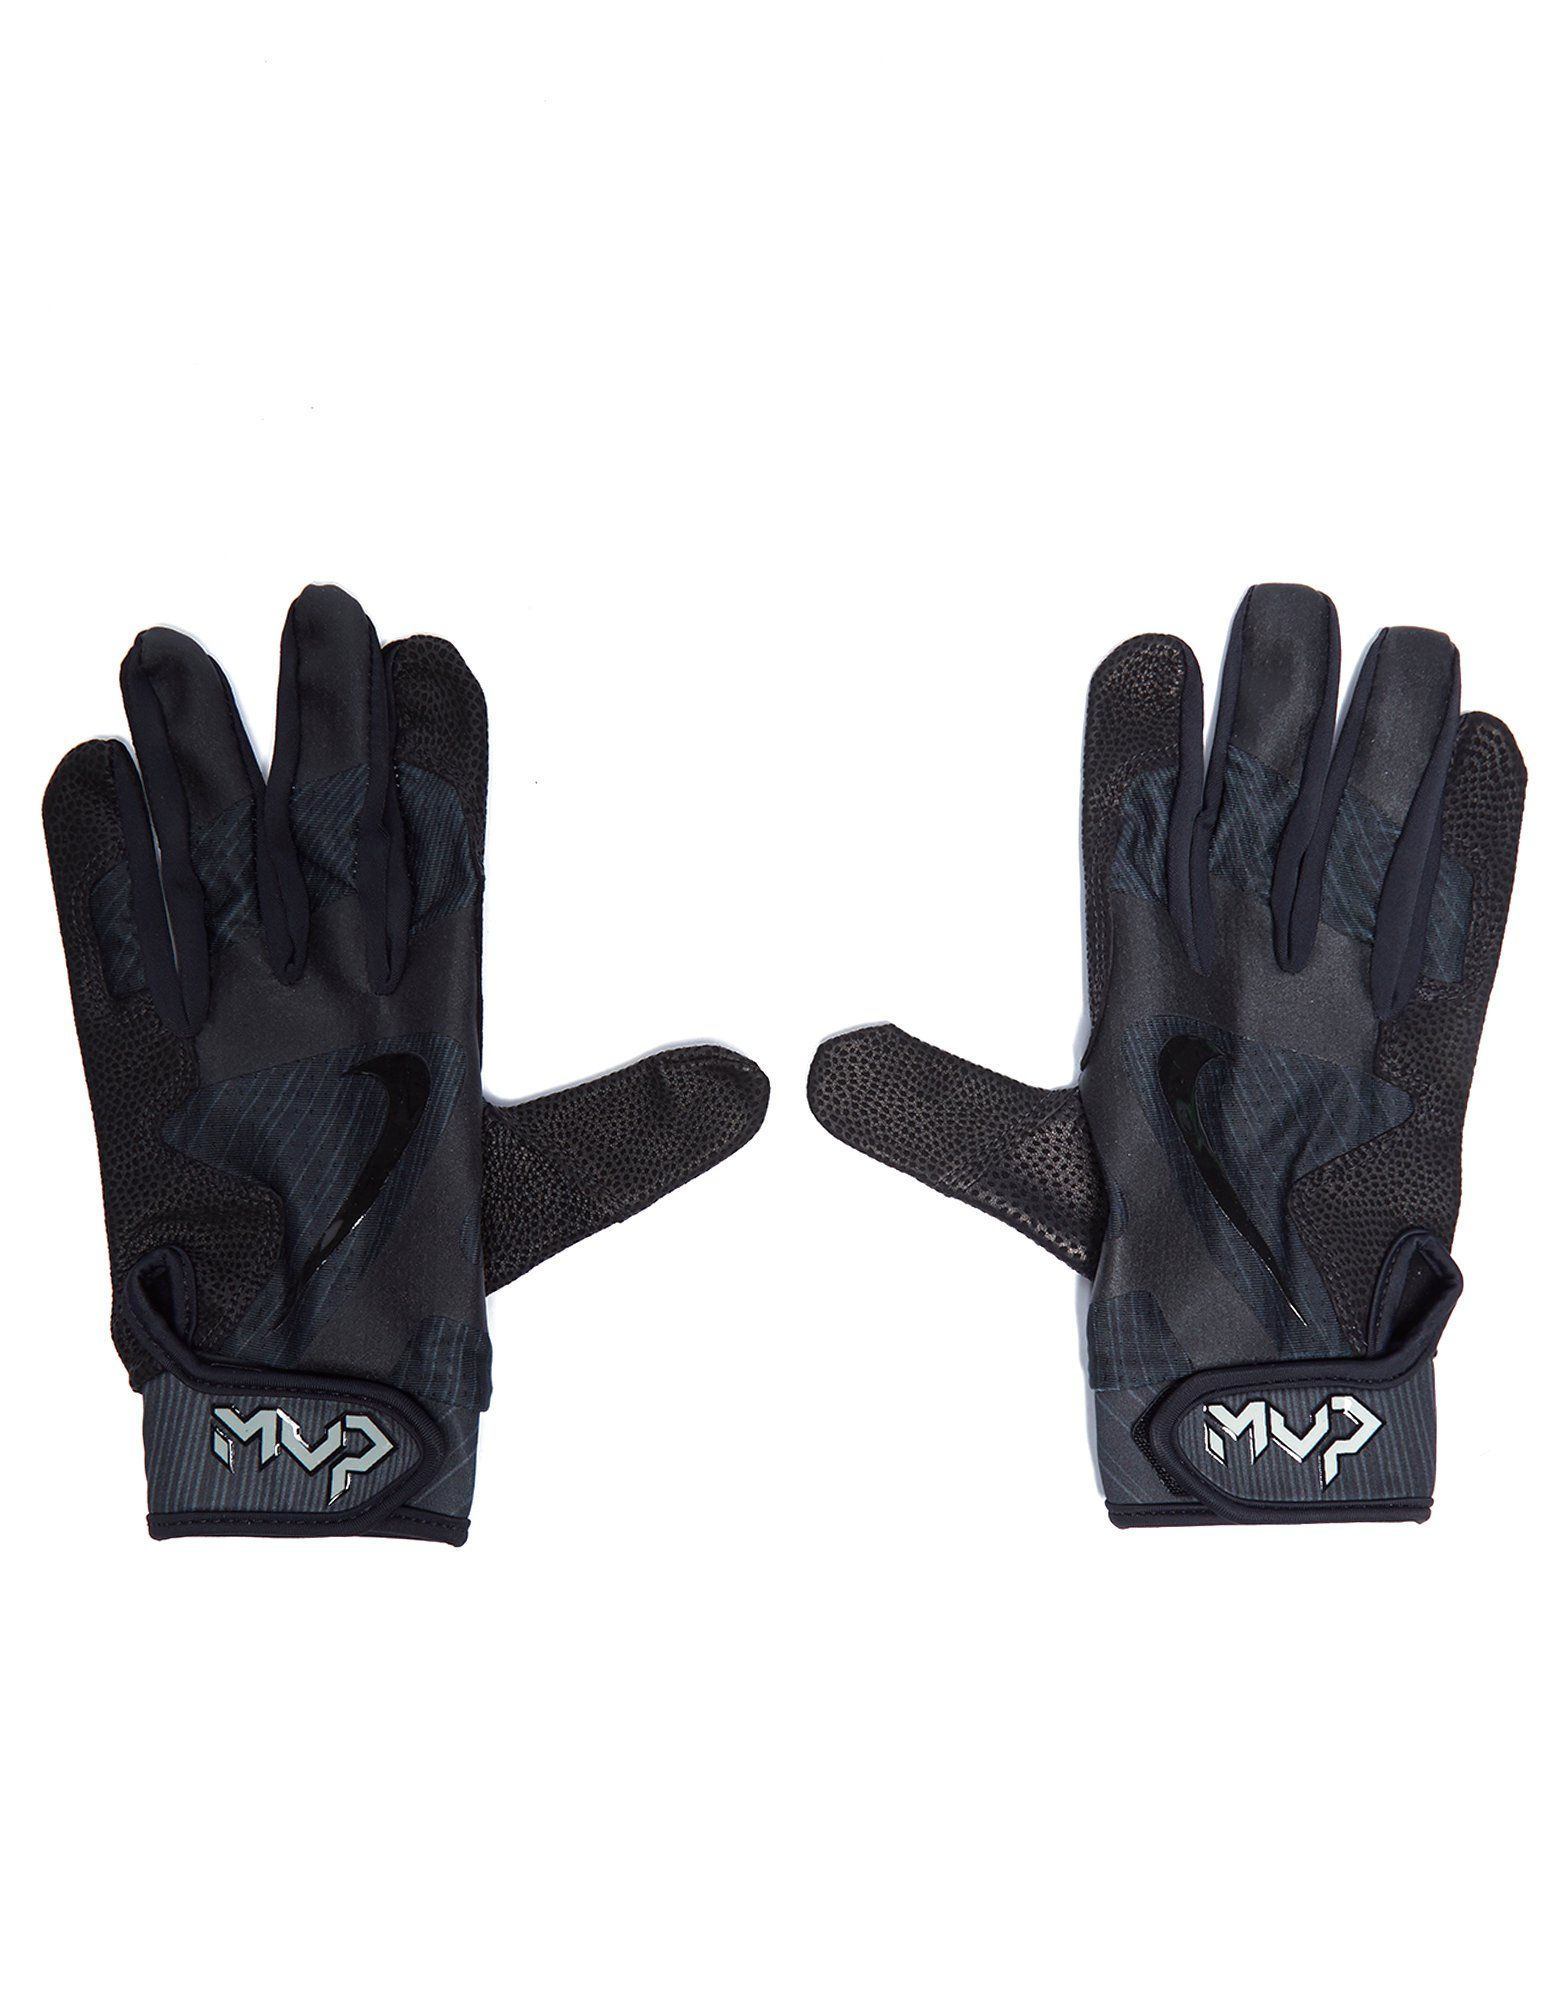 Mens nike leather gloves - Black Nike Gloves Jd Black Nike Gloves Jd 1